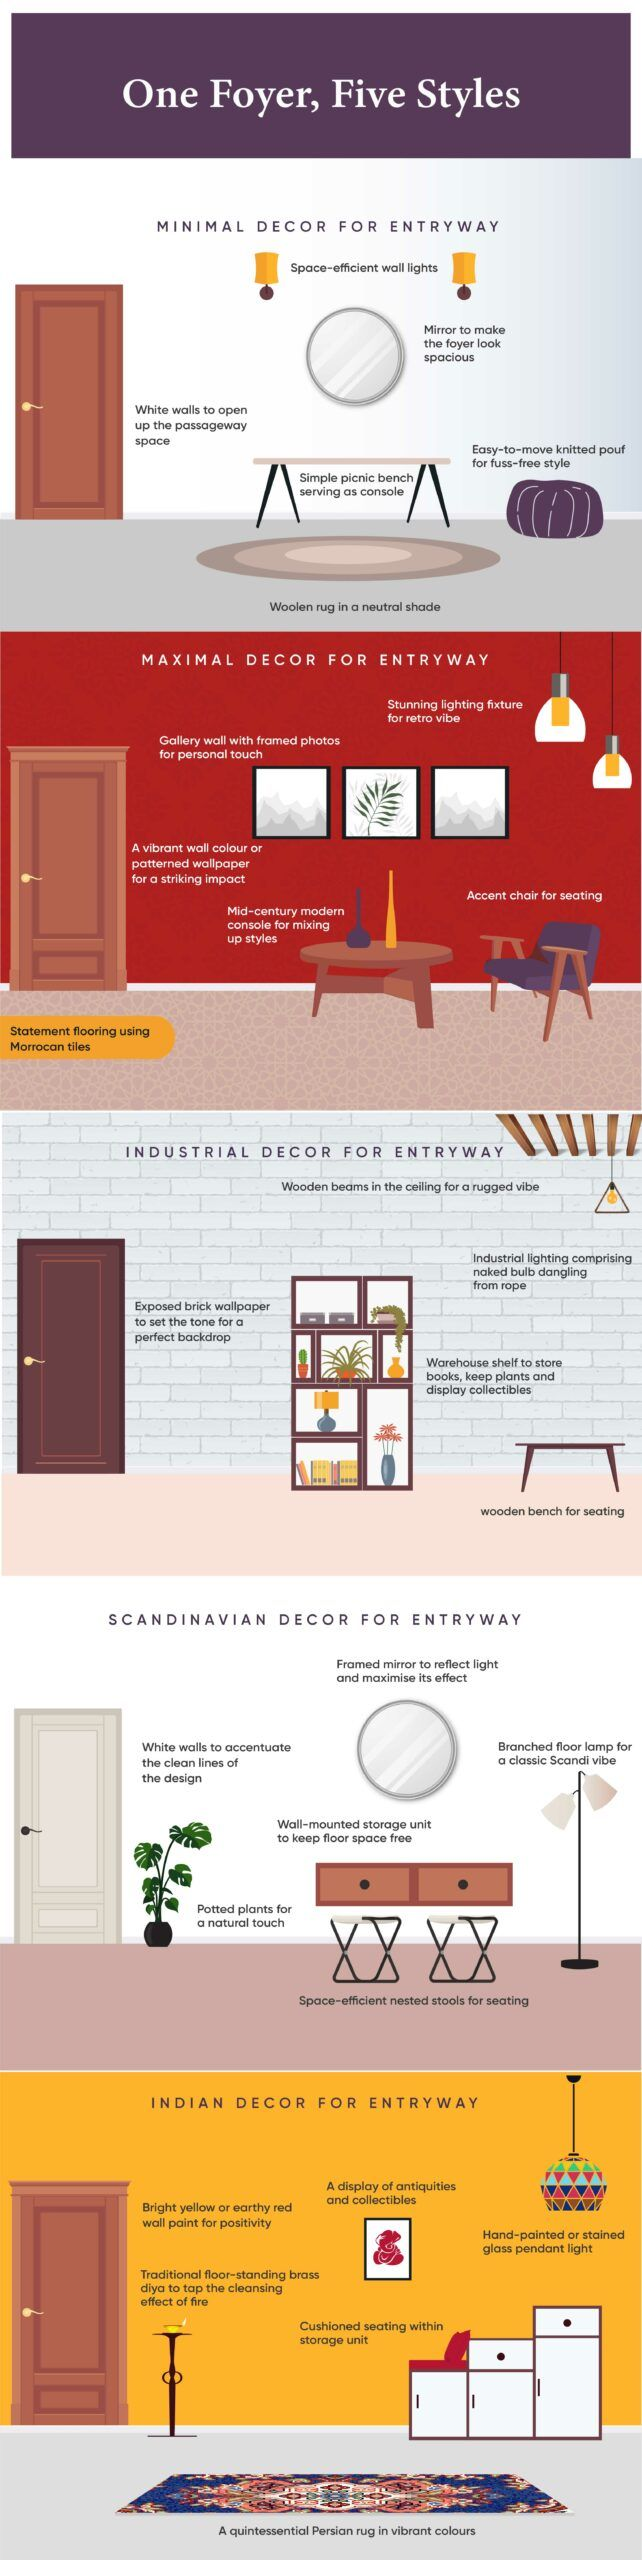 Infographic Foyer Design 0011 03 2